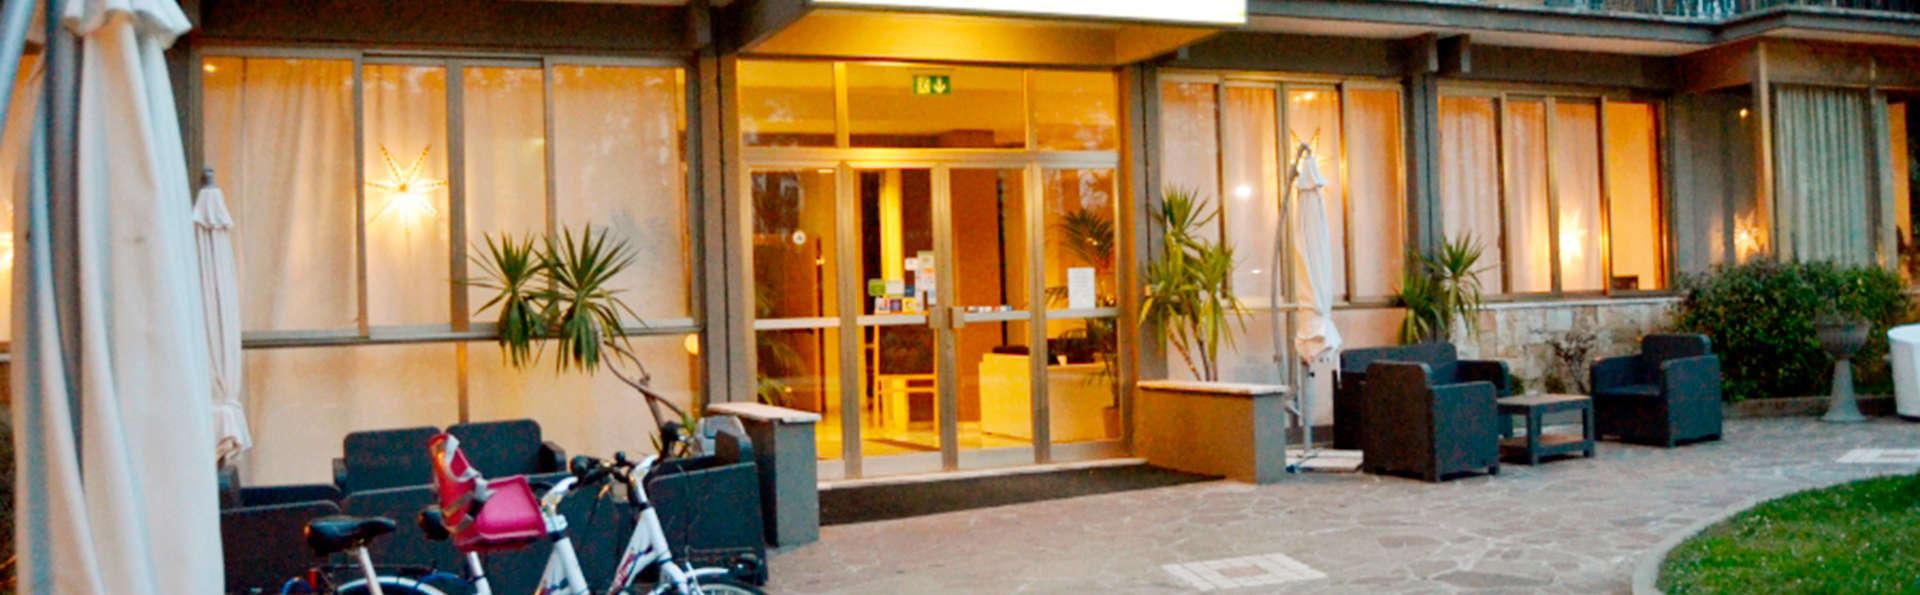 Hotel delle Terme & SPA**** - EDIT_NEW_front.jpg